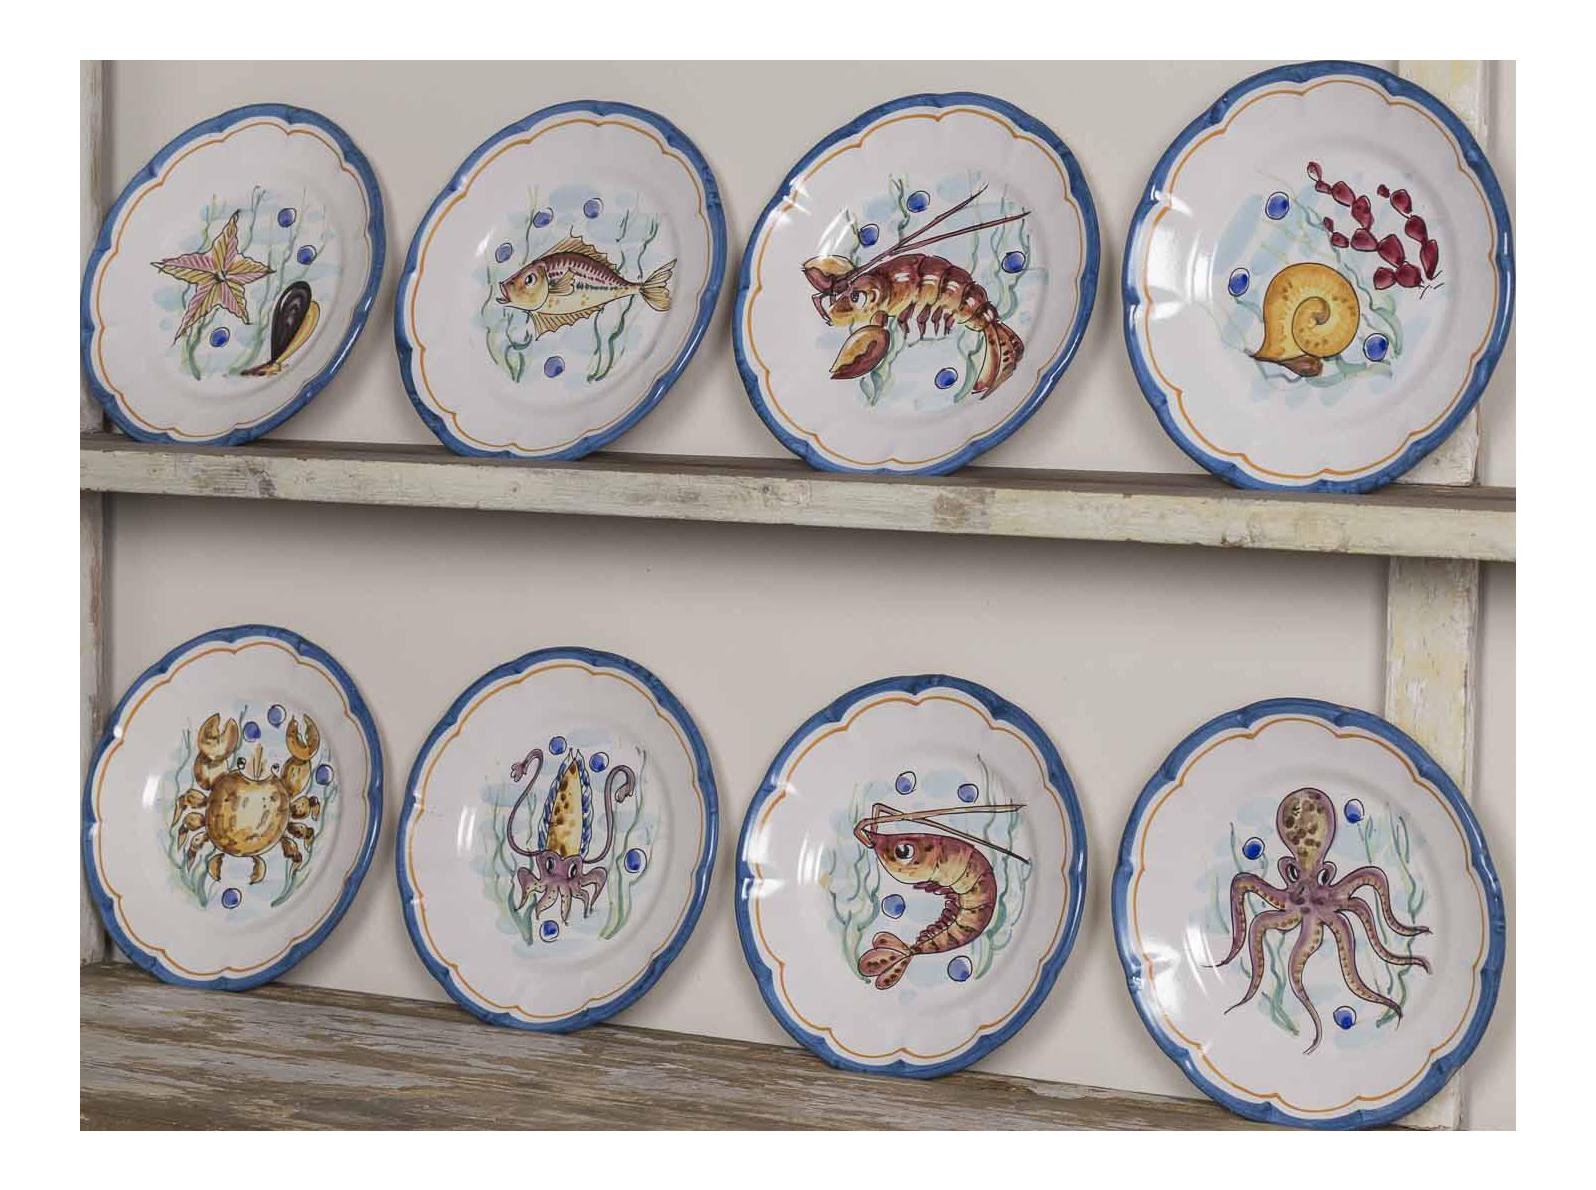 Set Eight Italian Hand Painted Plates Vietri - Image 1 of 11  sc 1 st  Decaso & Distinguished Set Eight Italian Hand Painted Plates Vietri | DECASO